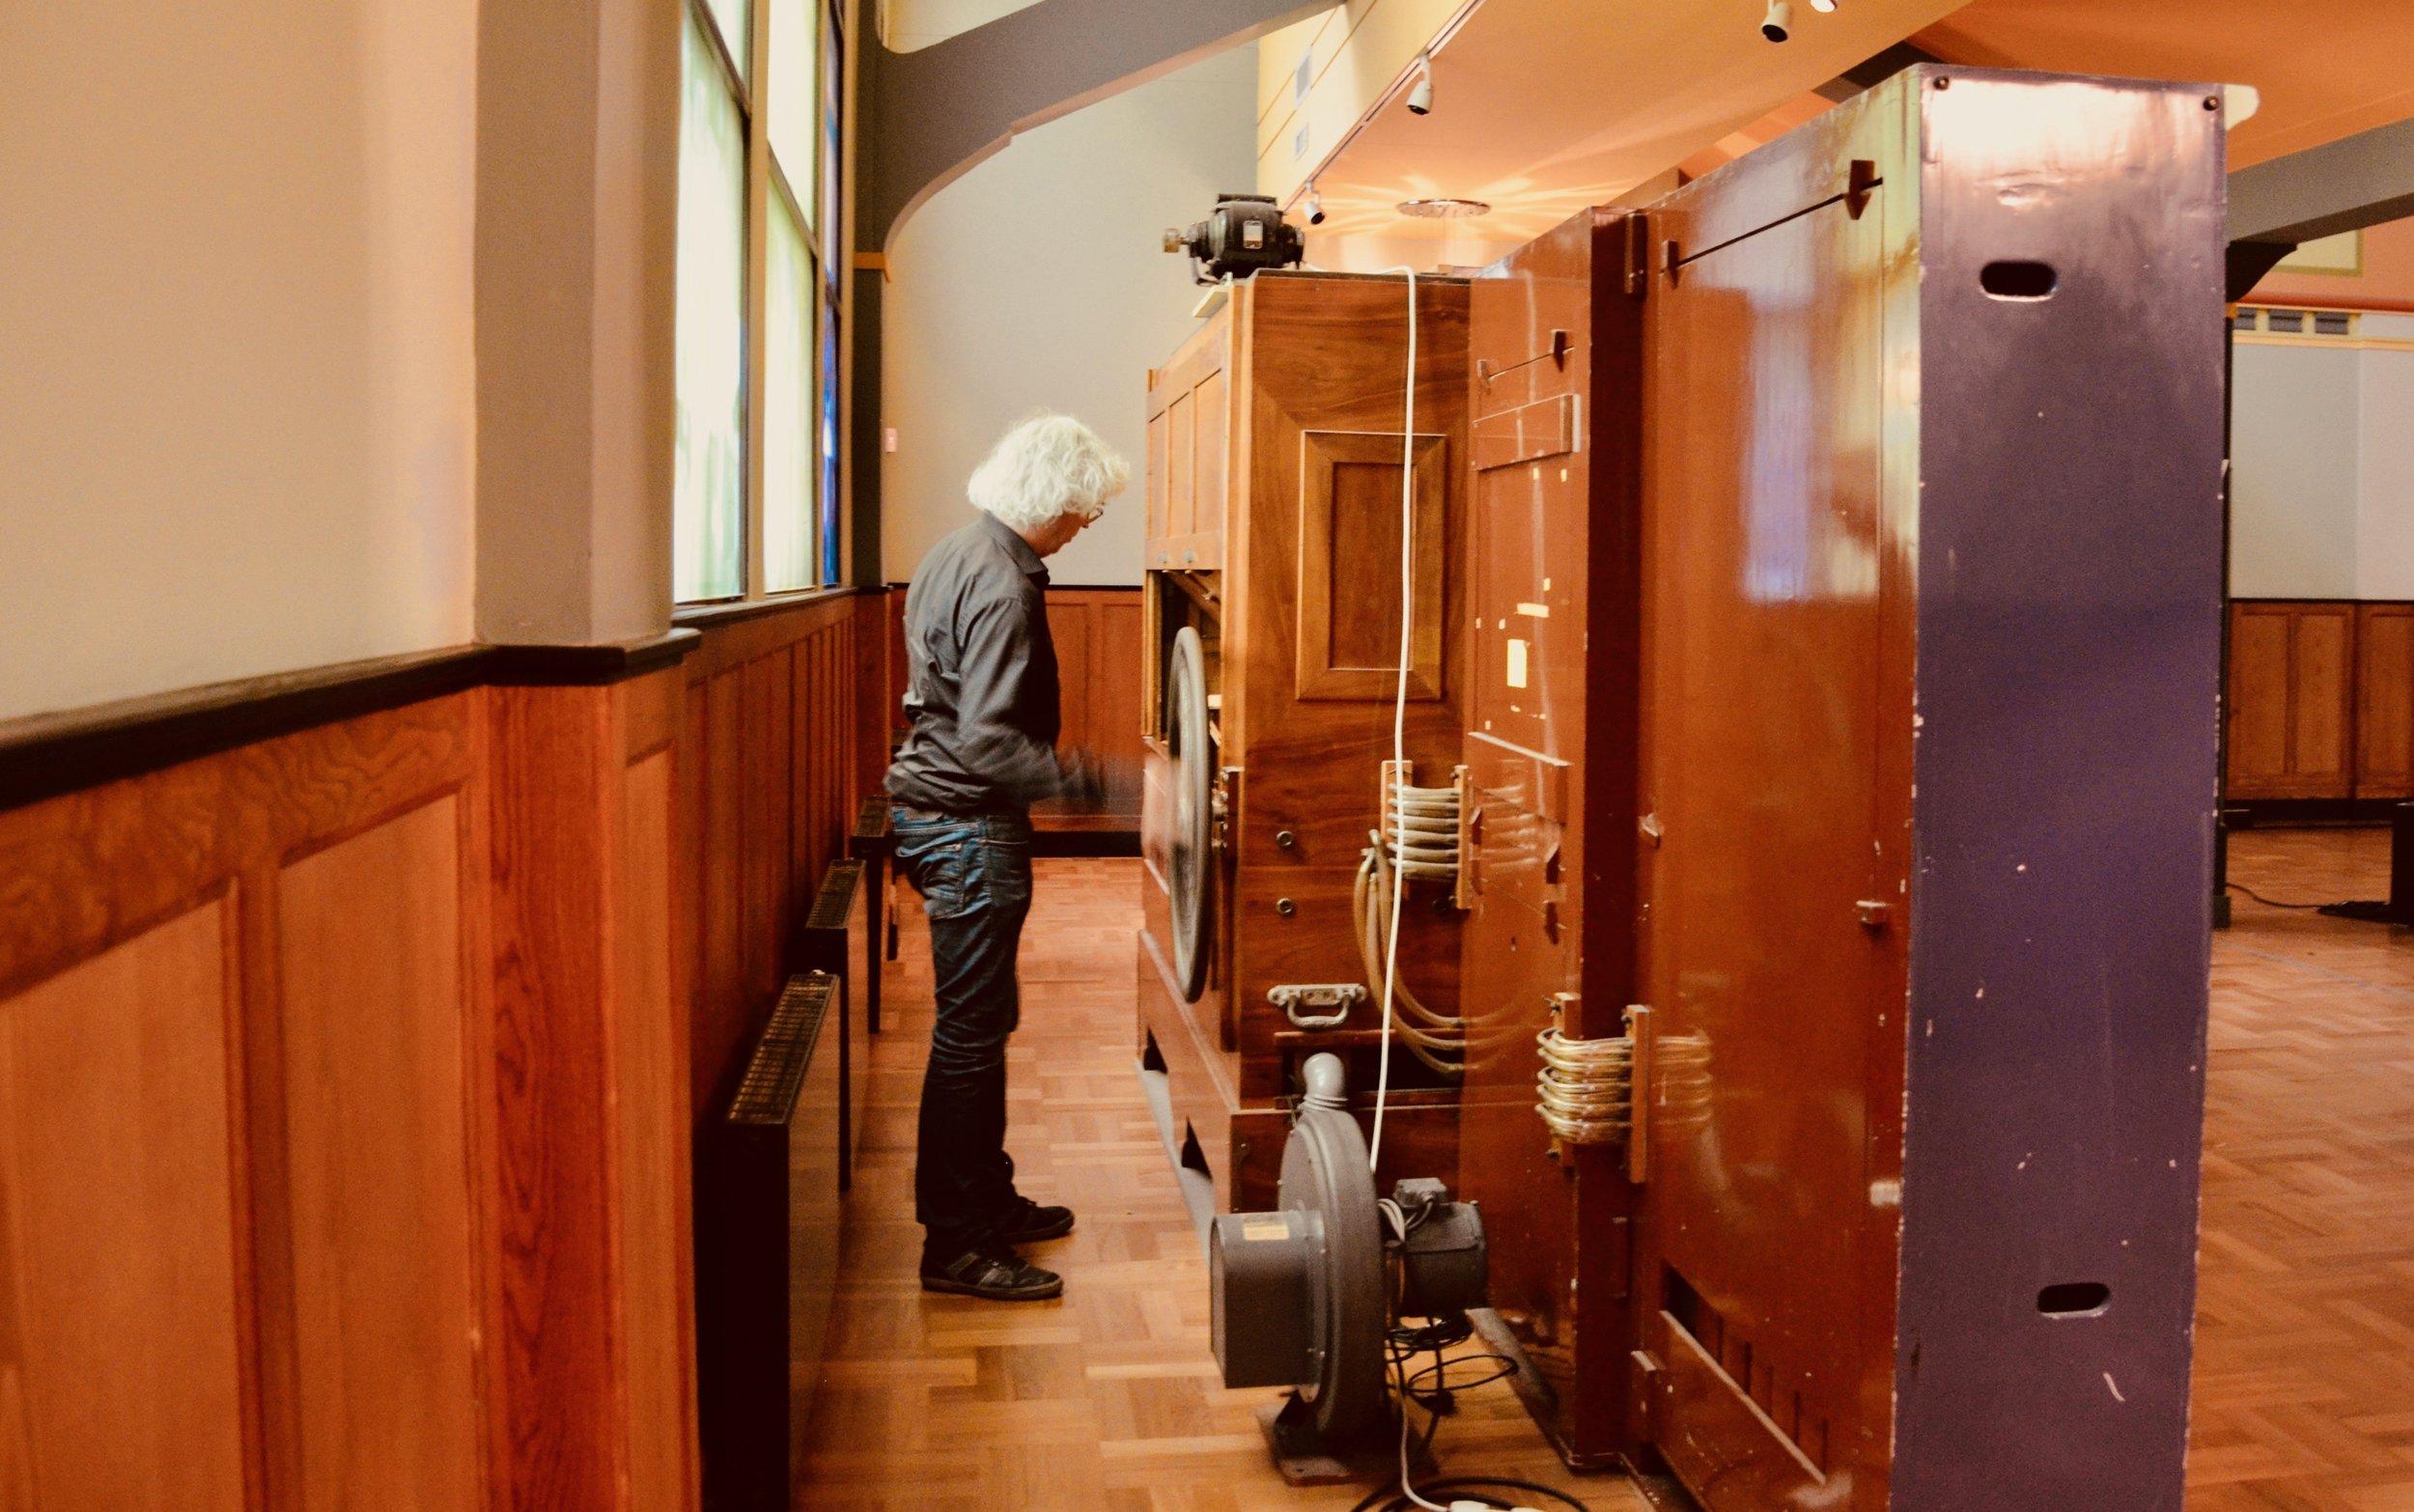 Hans Fidom operates the mechanical organ at Orgelpark, Amsterdam.